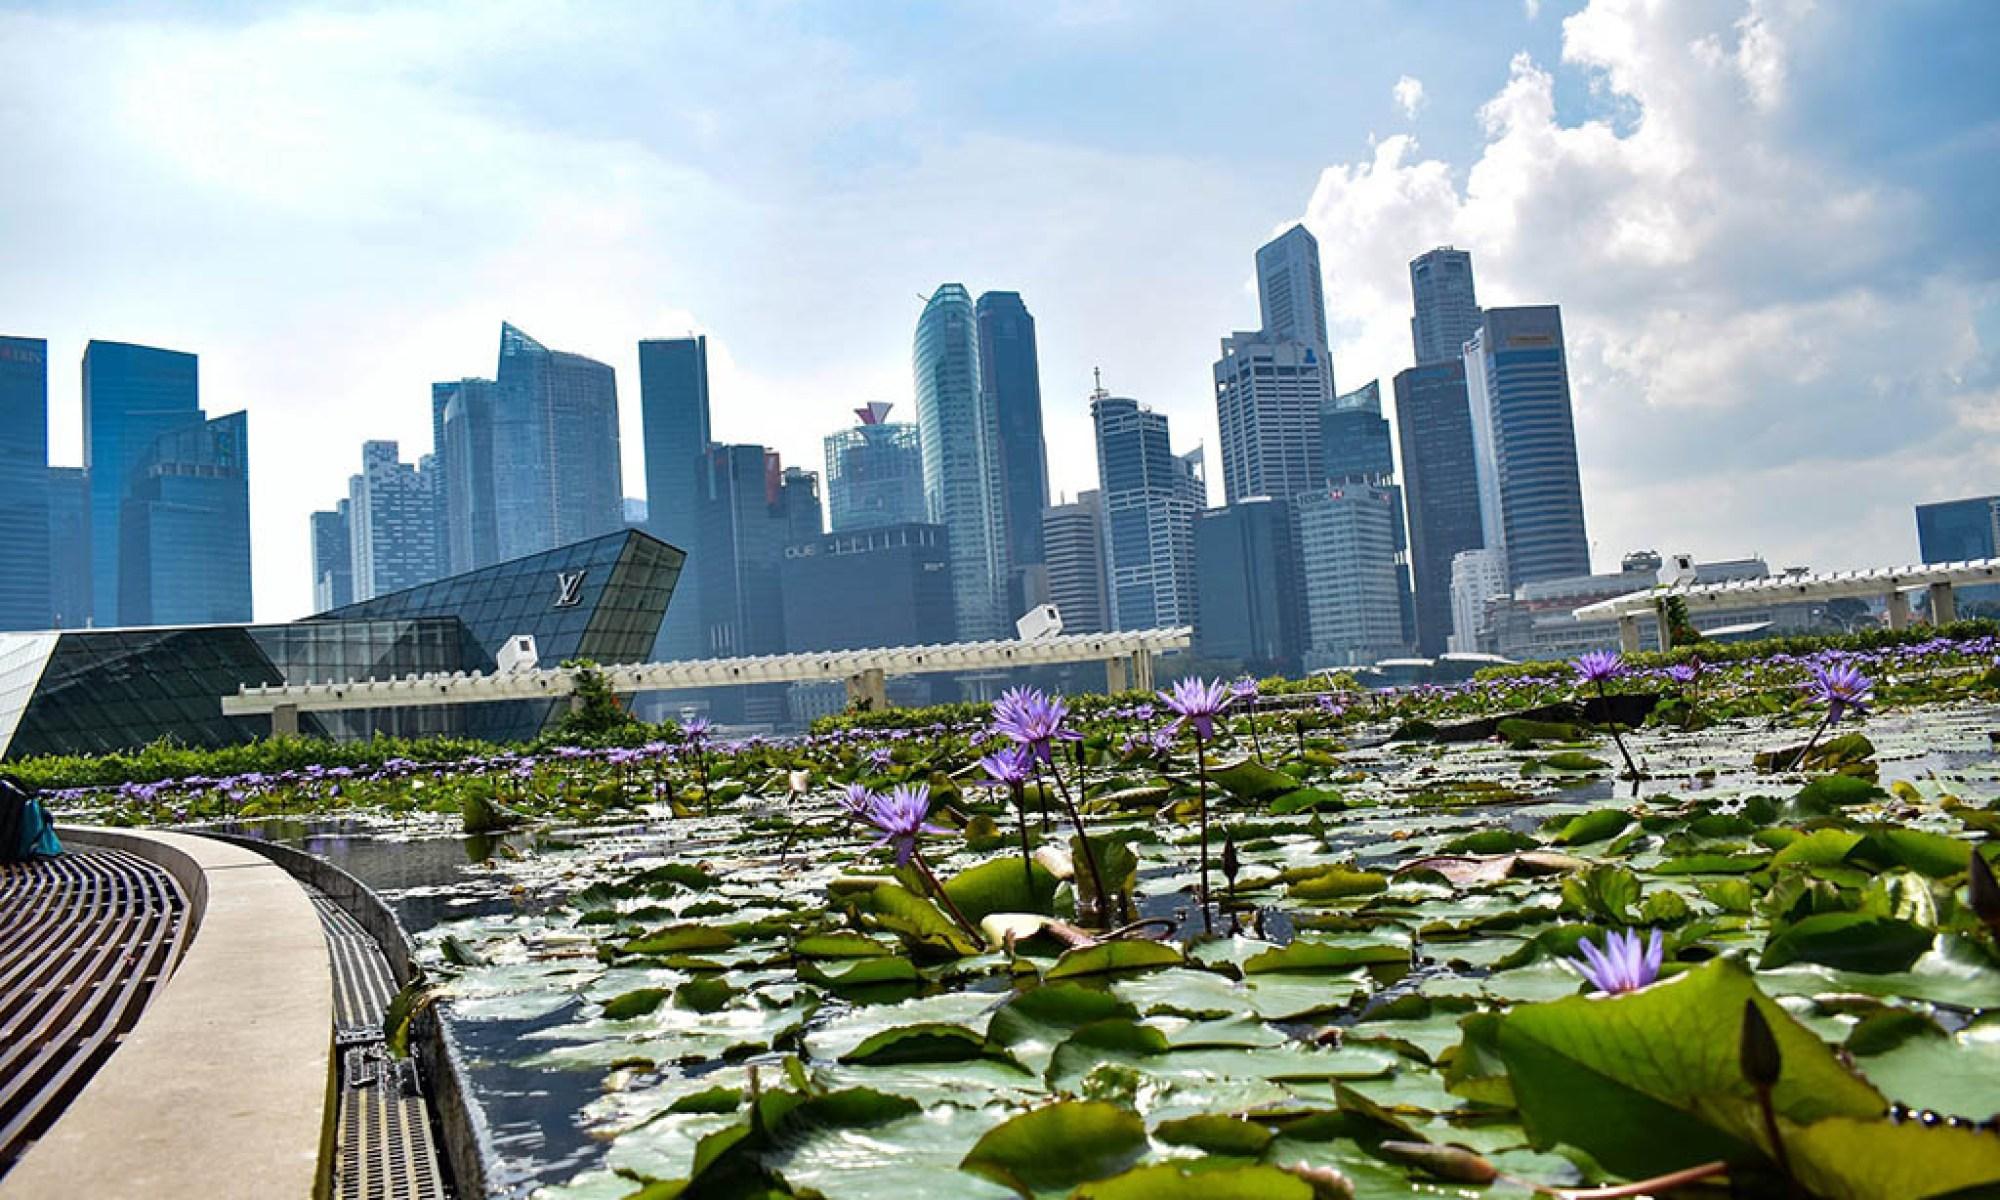 Singapore City financial district